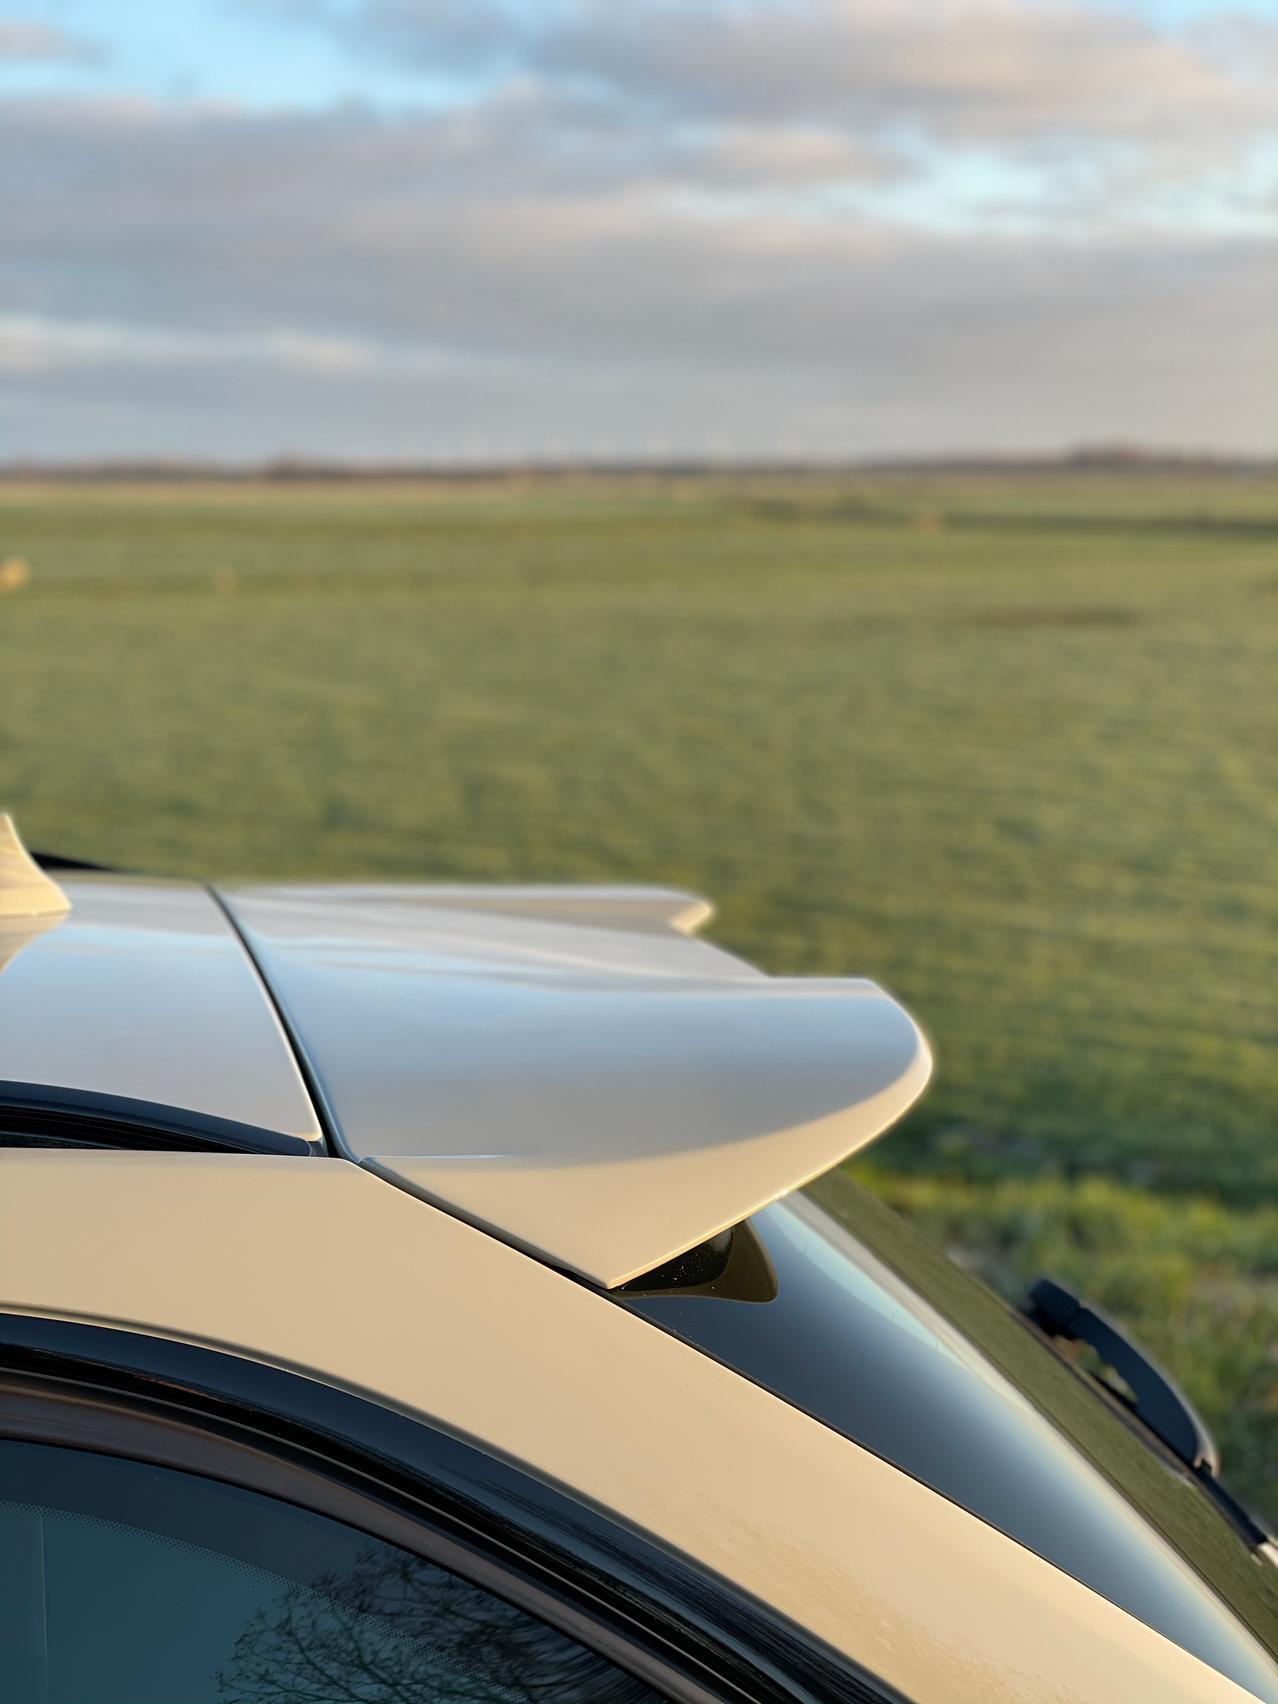 BMW M3 CS Touring rear spoiler